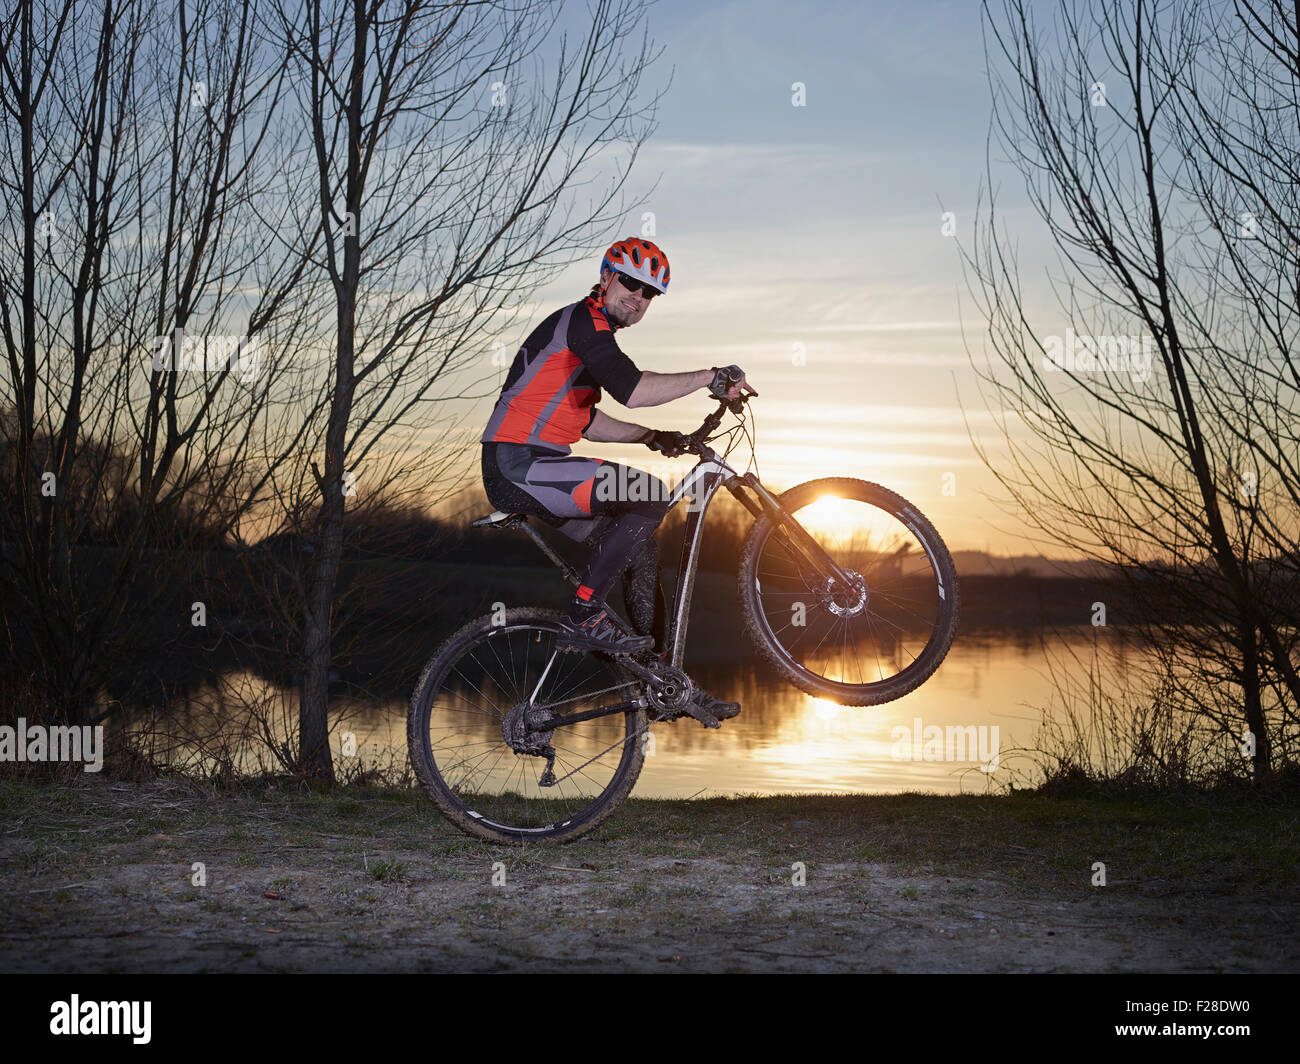 Reifer Mann tun Stunts auf Mountainbike bei Sonnenuntergang, Bayern, Deutschland Stockbild